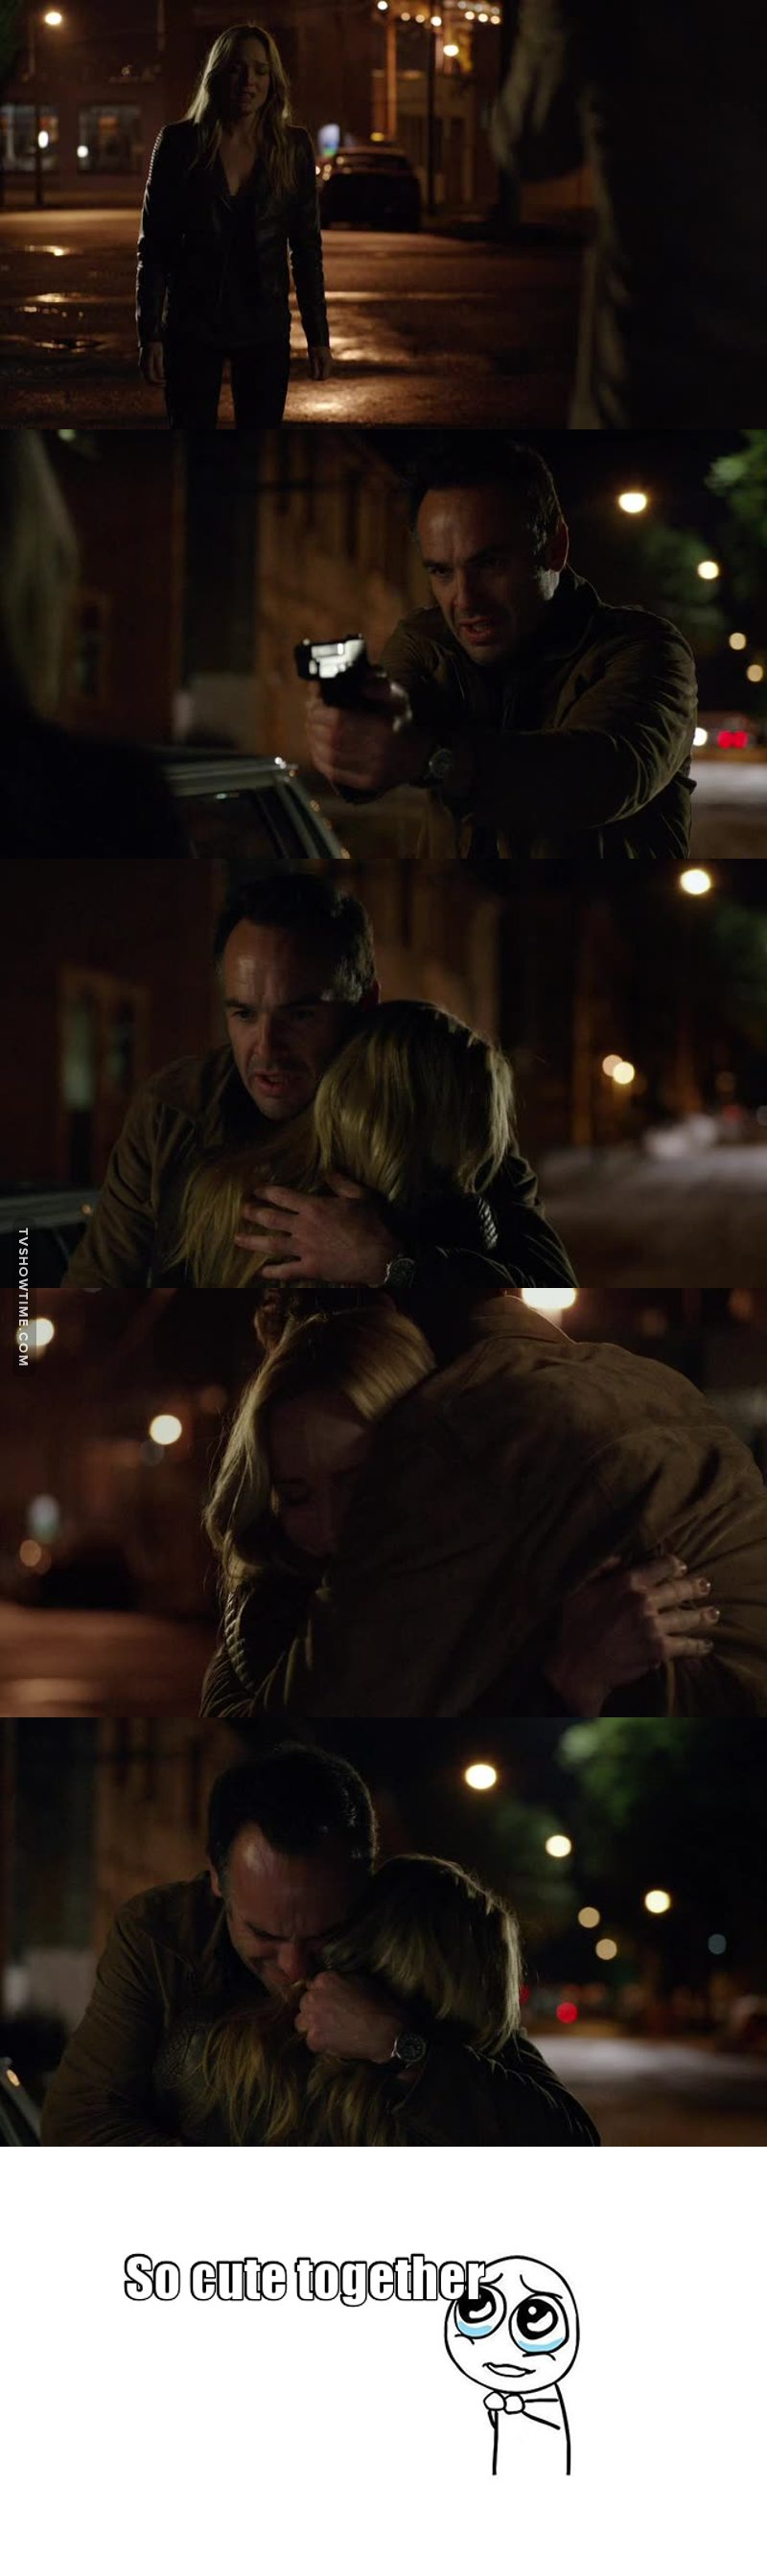 Amazing scene... I'm so happy for them